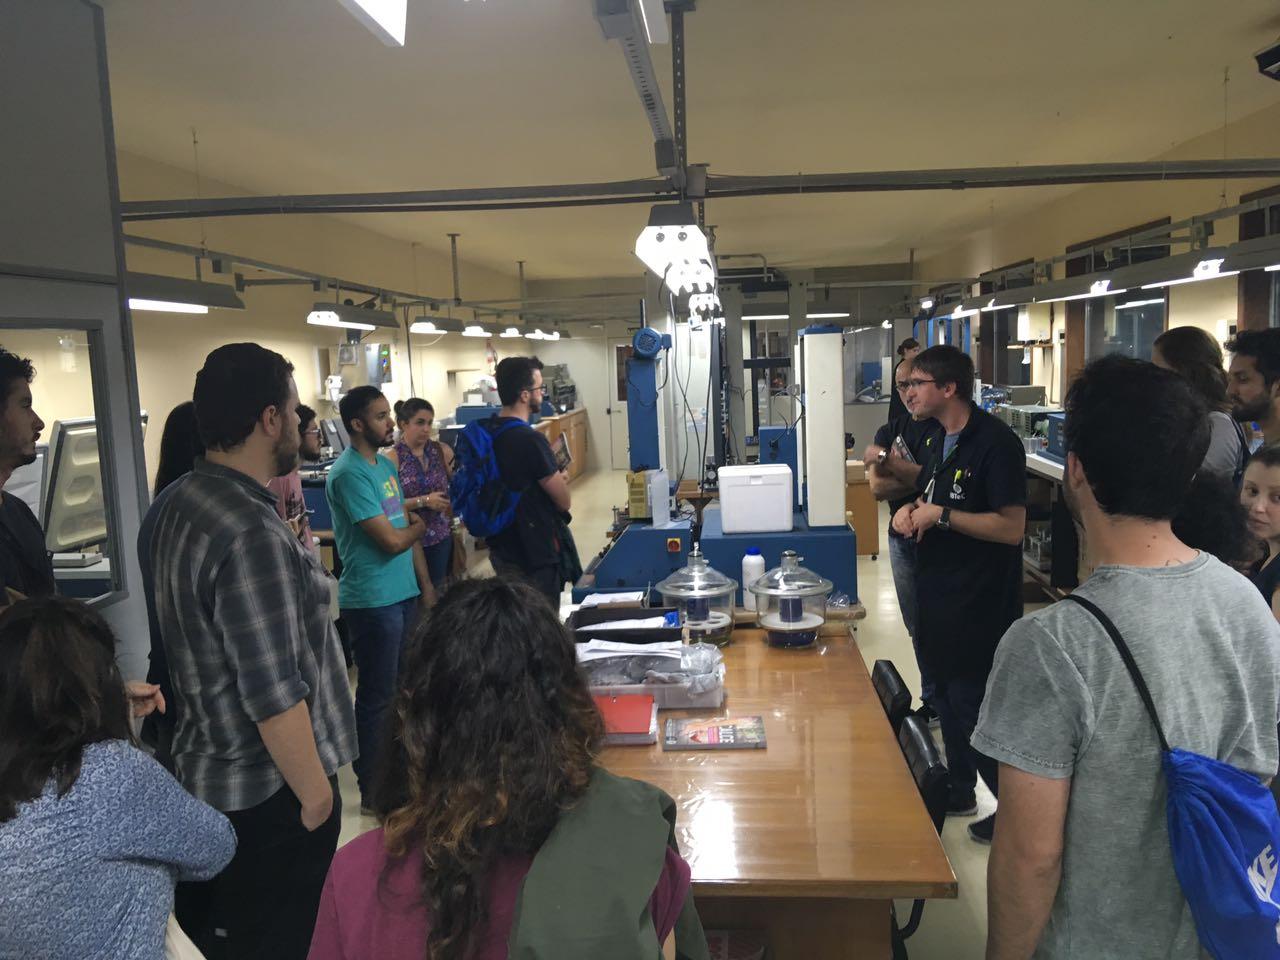 Turma de Alunos da Unisinos realiza visita técnica no IBTeC